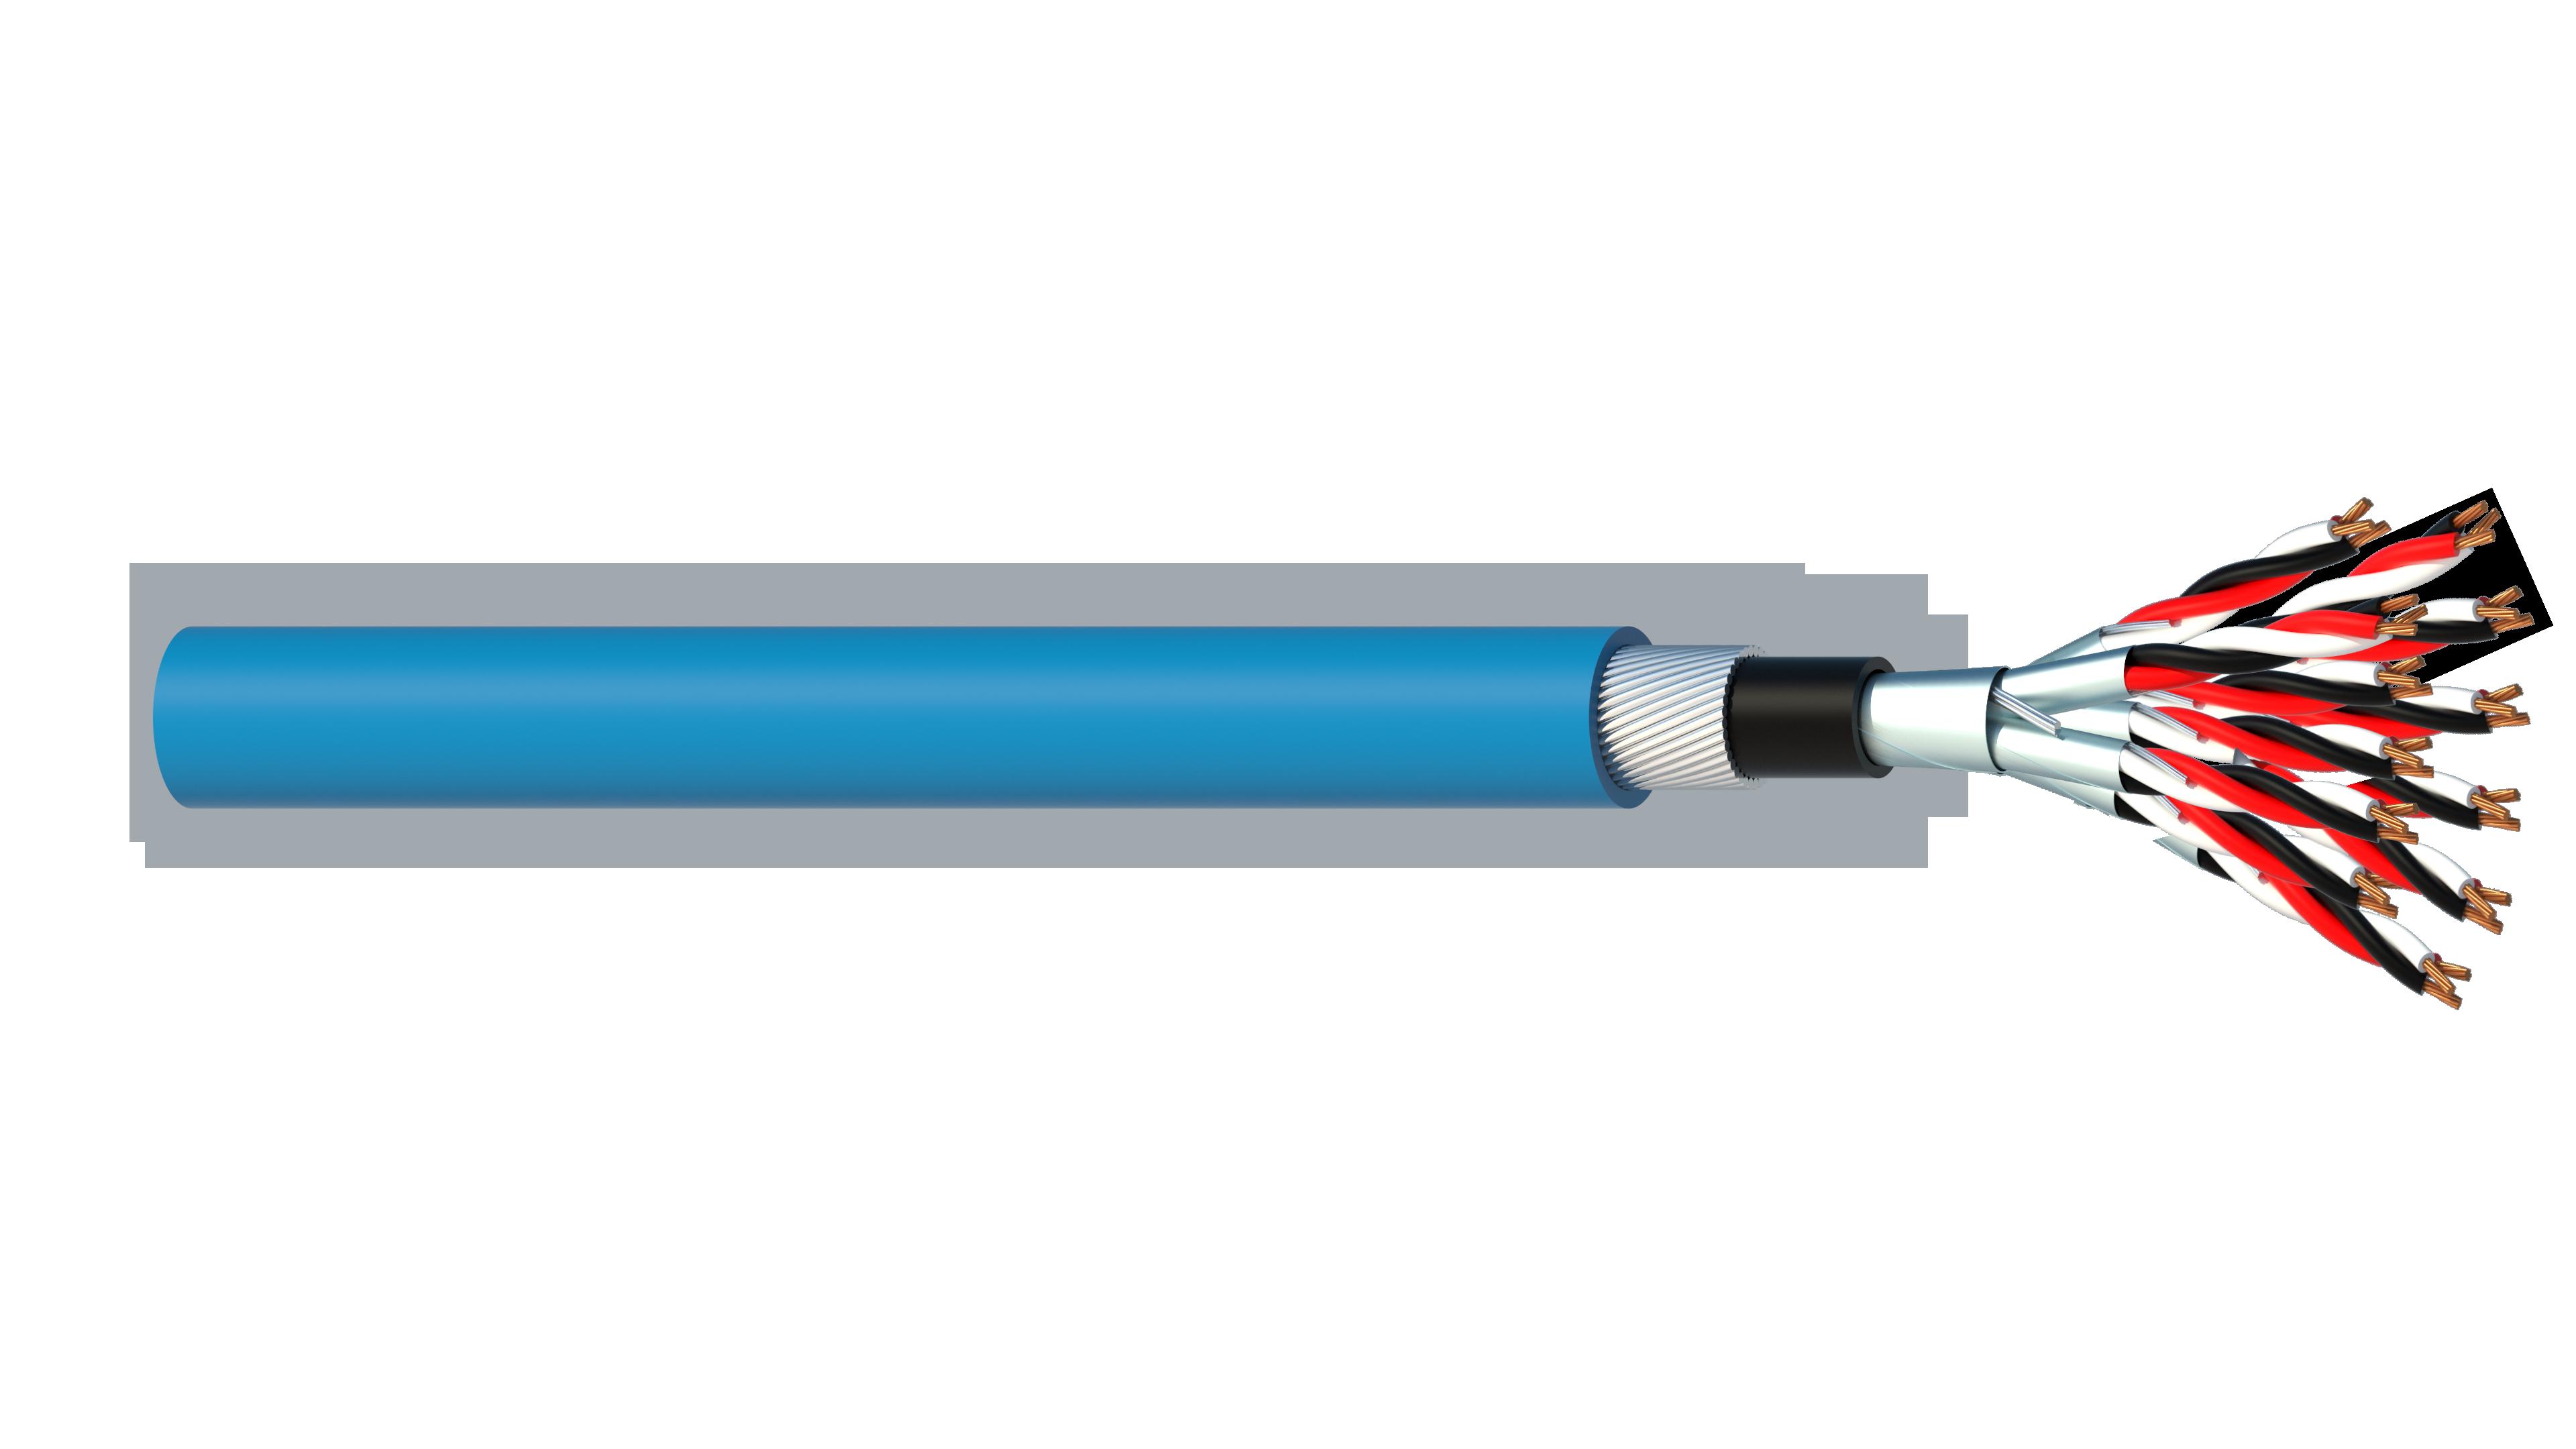 12 Triad 0.5mm2 Cu/PVC/ISOS/PVC/SWA/PVC Maser Instrumentation Cable - Blue Sheath